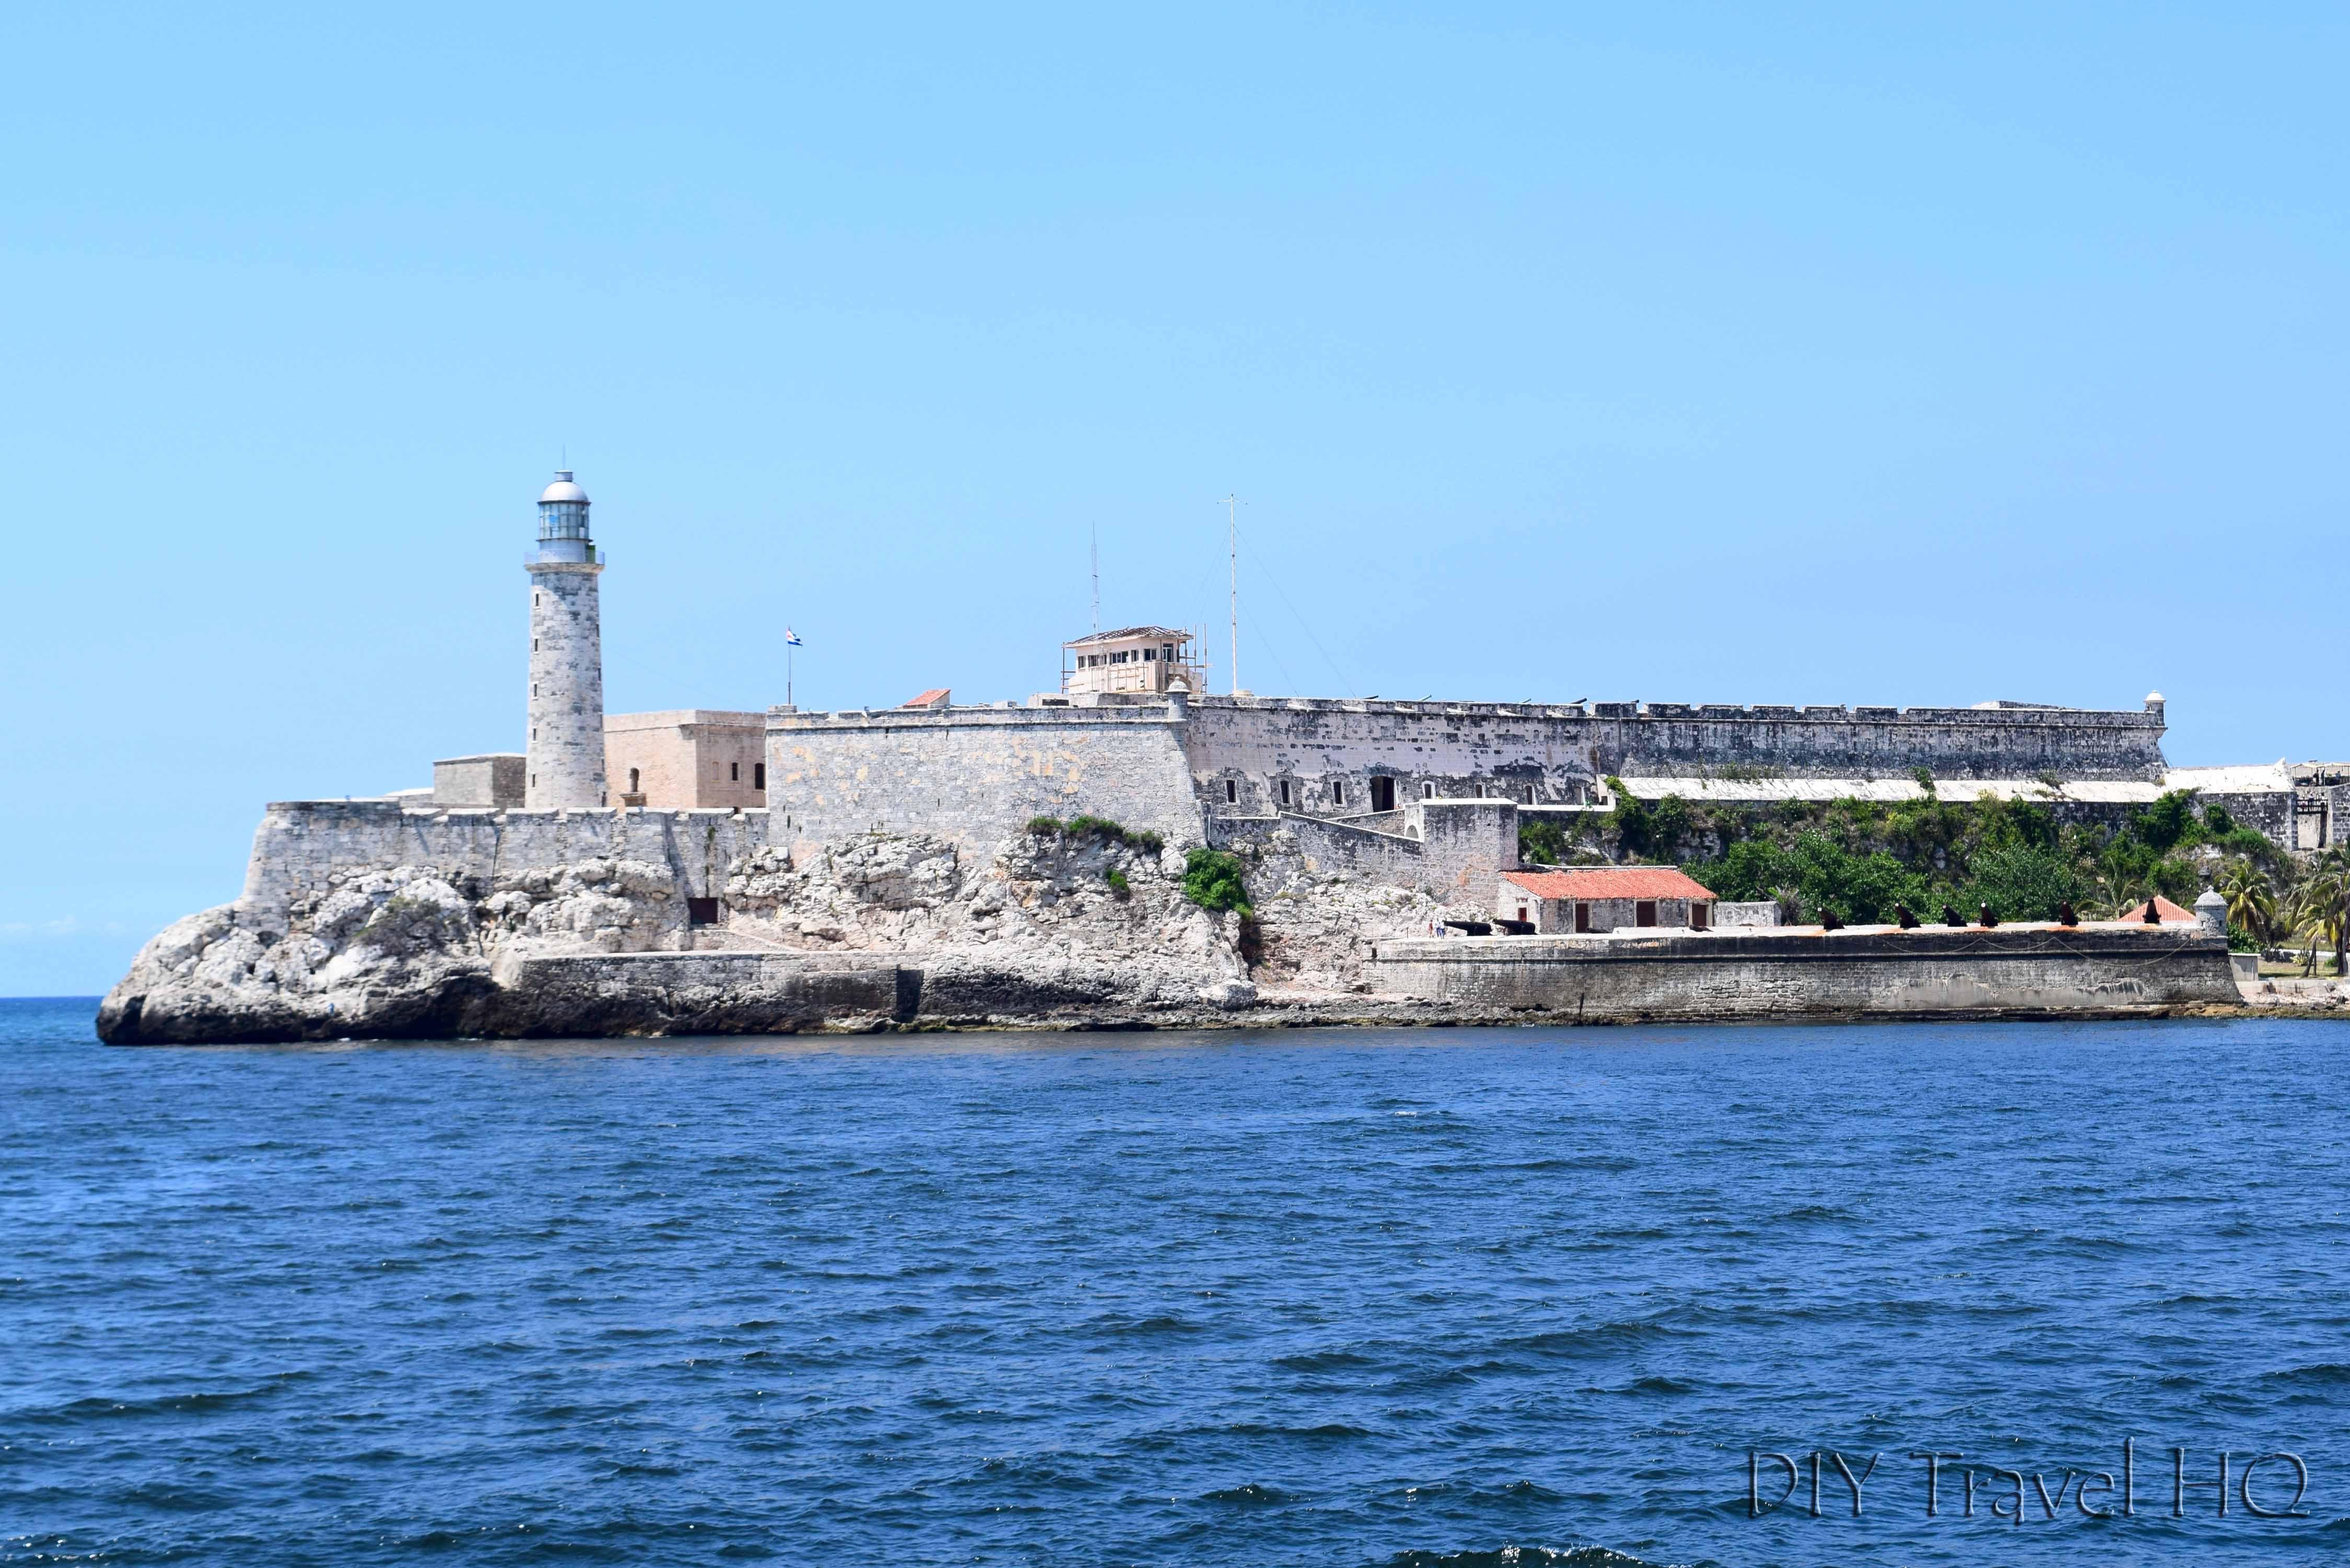 Casablanca Forts: Watching Over Havana - DIY Travel HQ